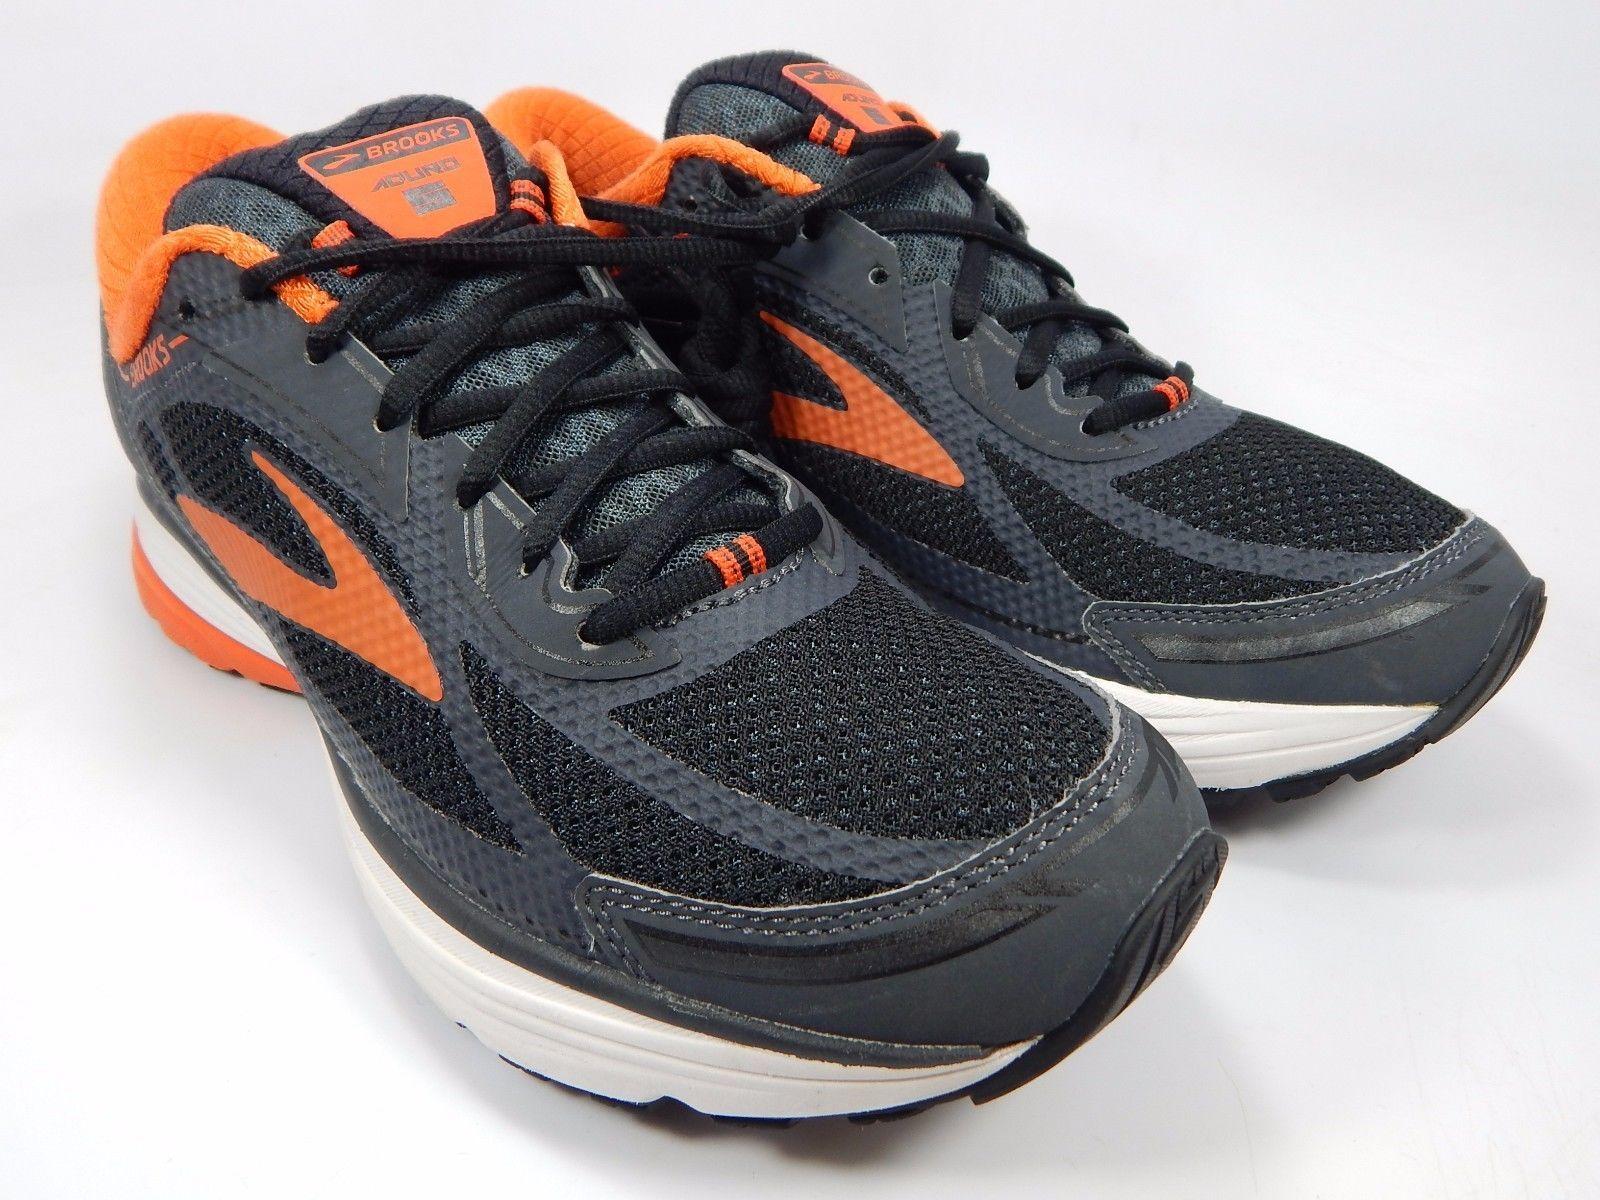 Brooks Aduro 5 Men's Running Shoes Sample Size US 9 M (D) EU 42.5 Gray Orange